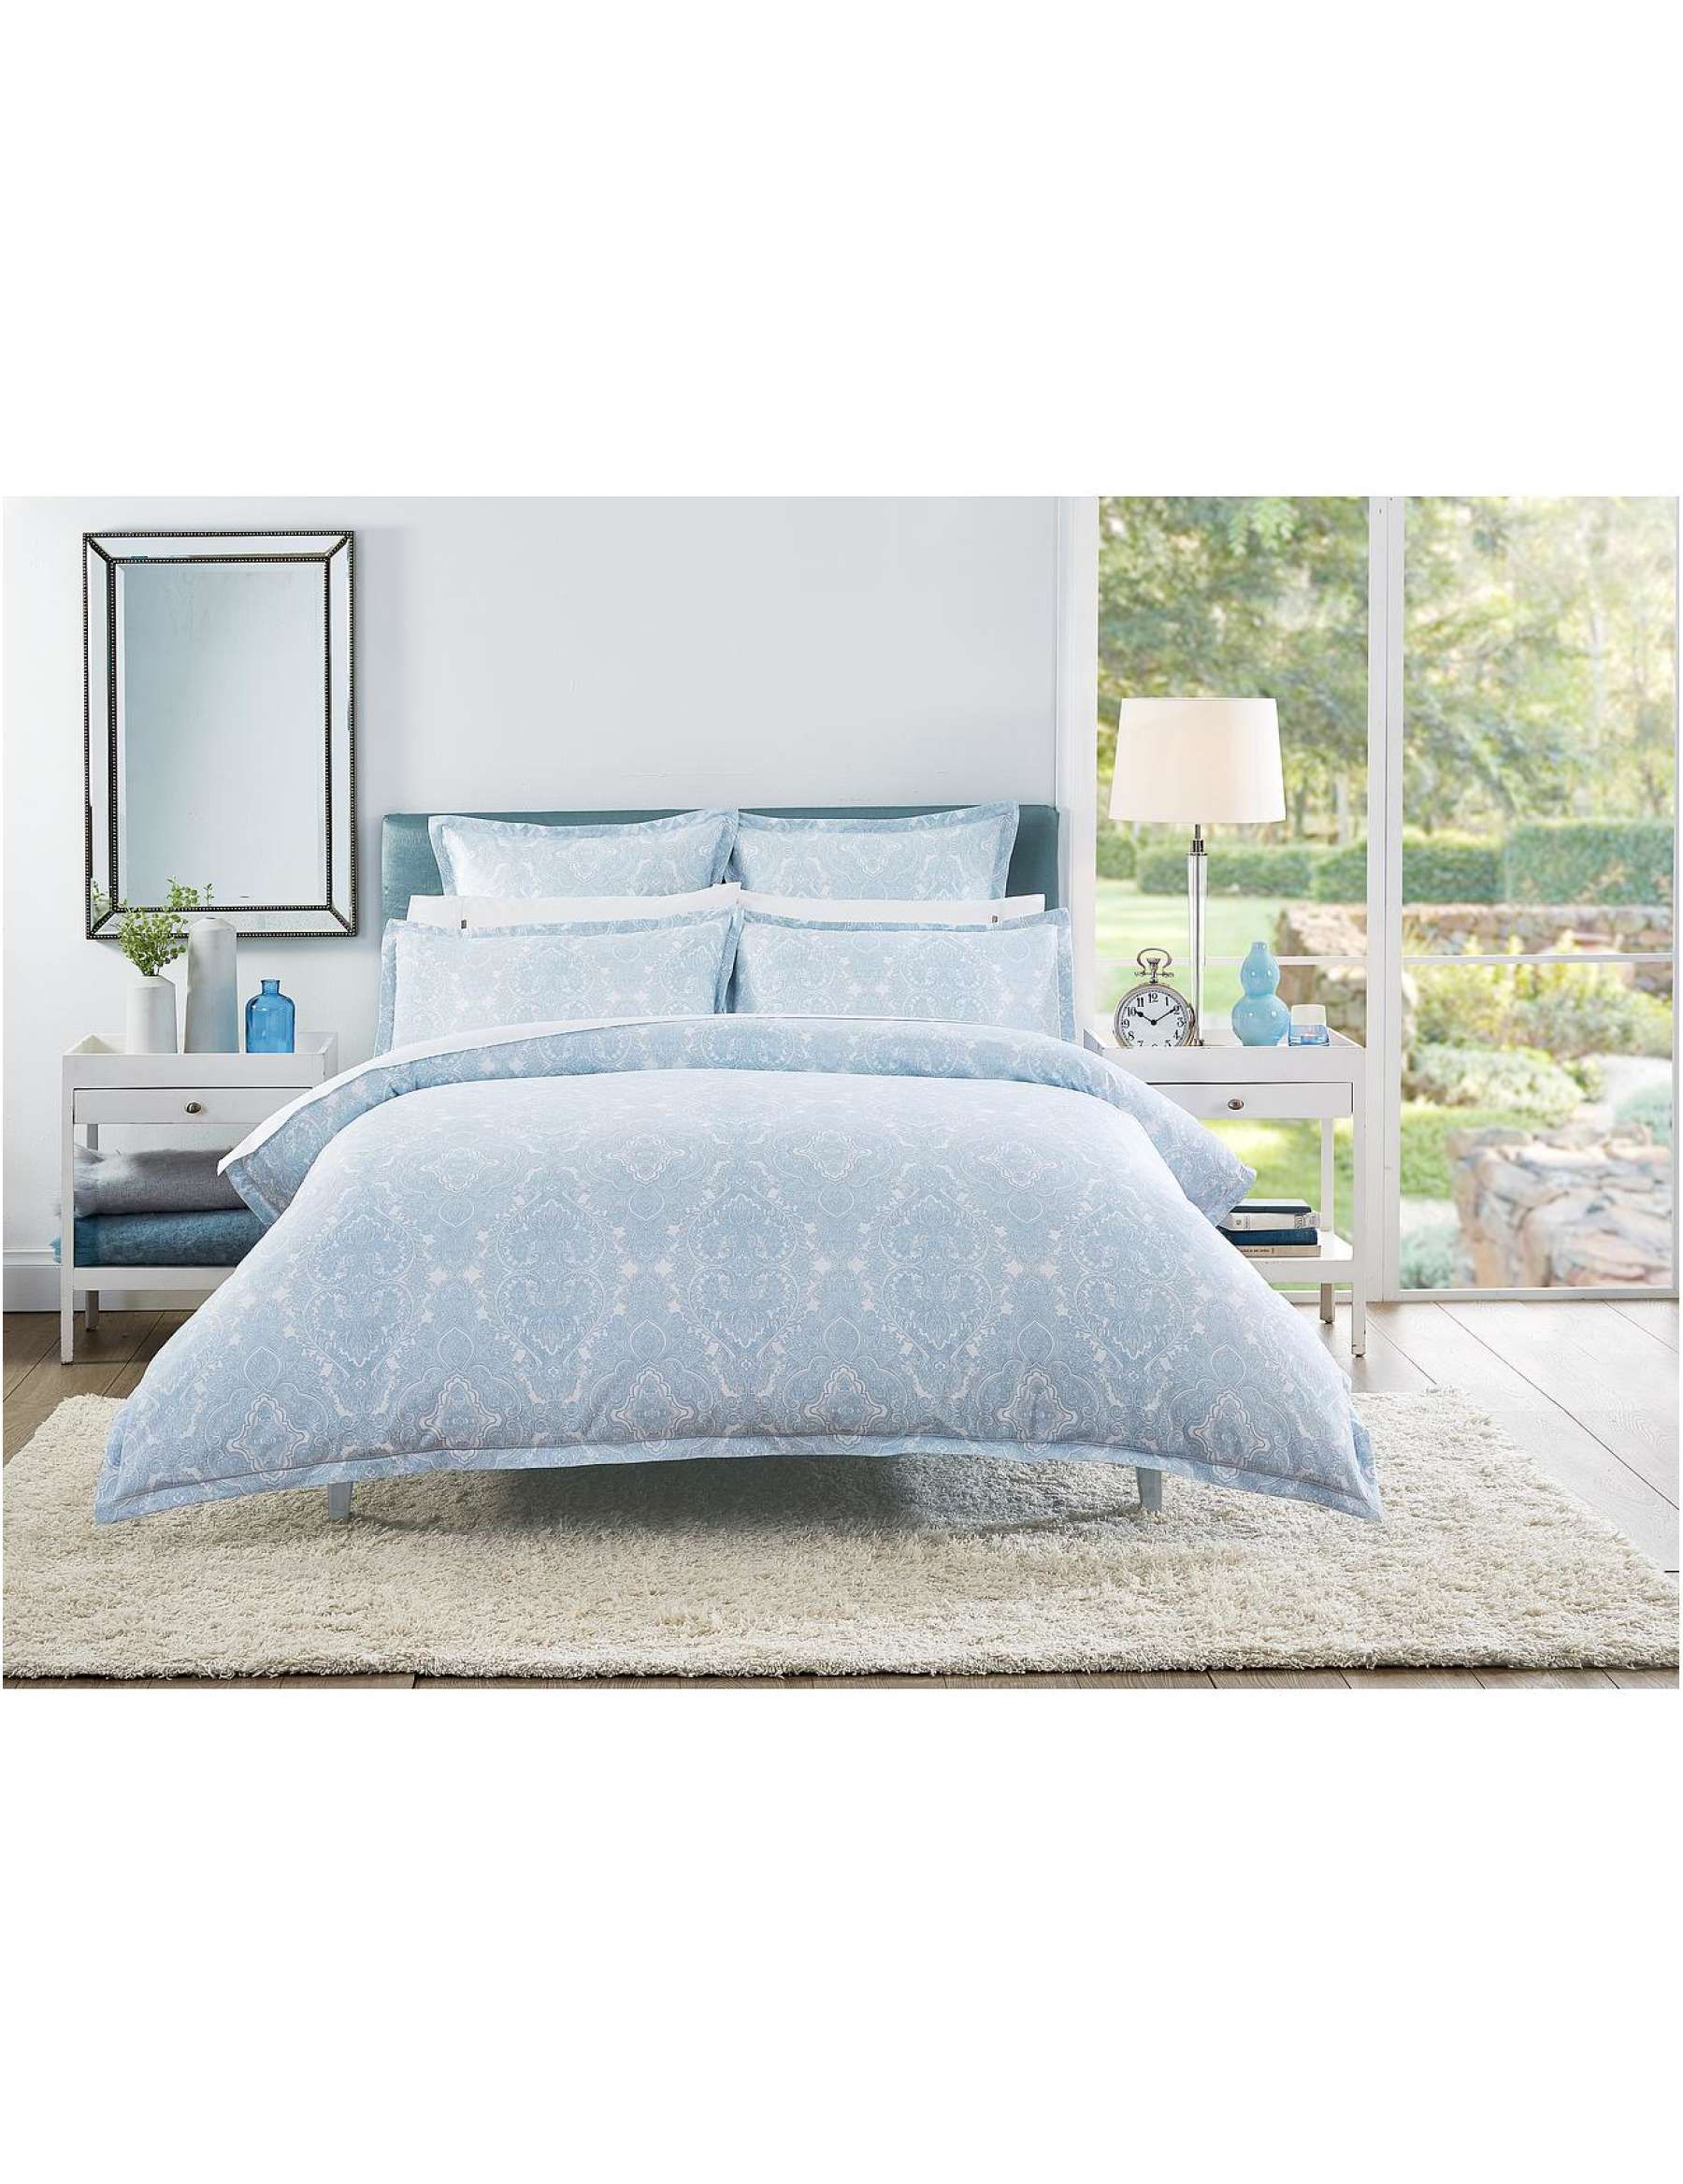 David Jones  Cotton House Ninevah Double Bed Quilt Cover